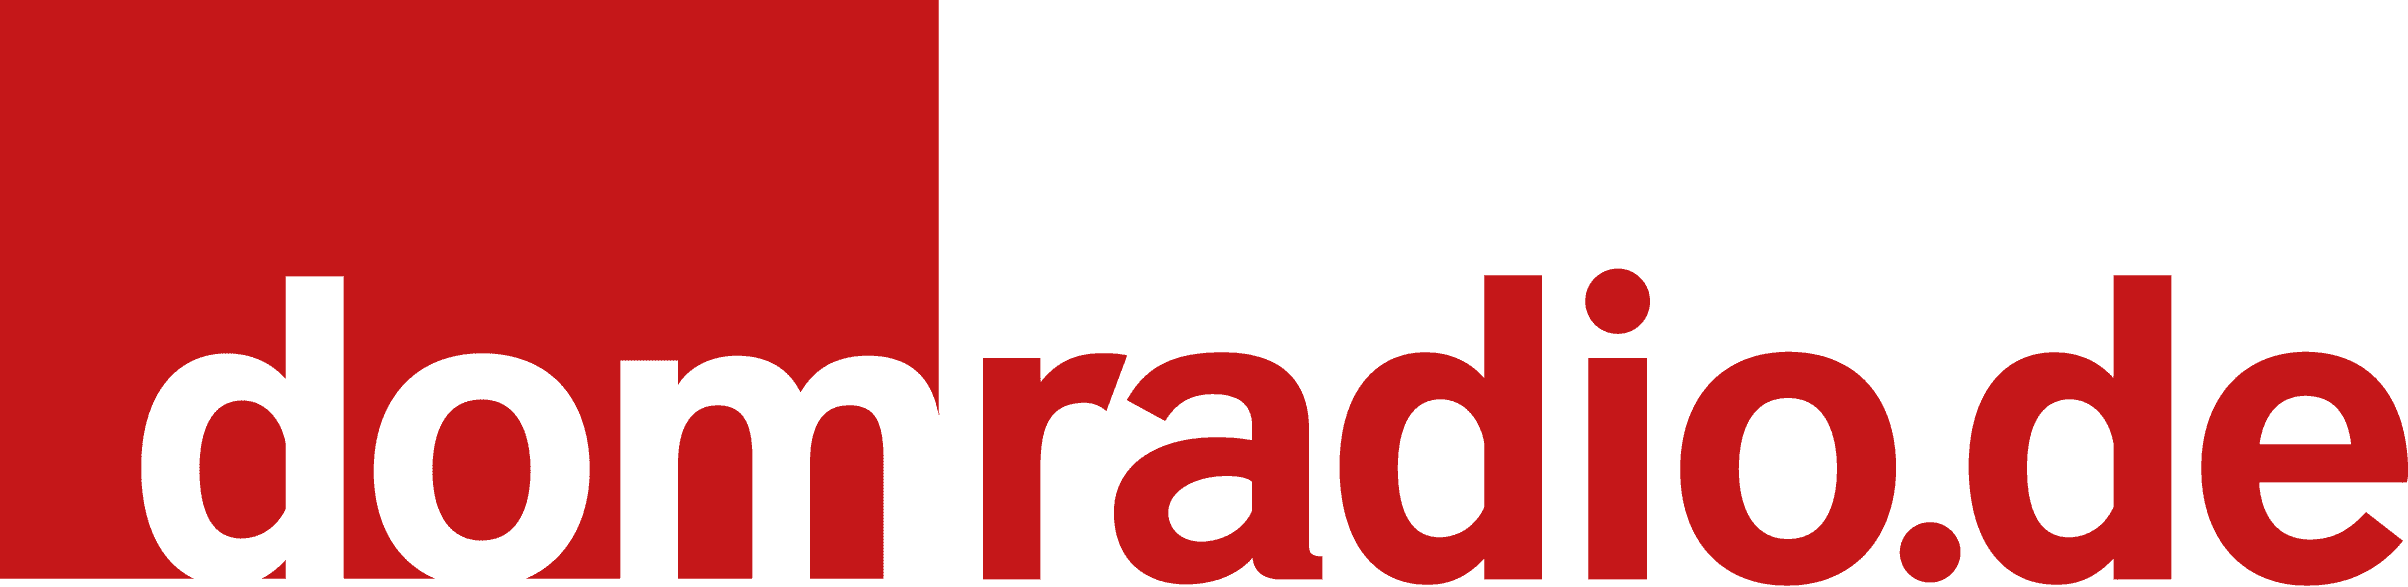 Logo Domradio